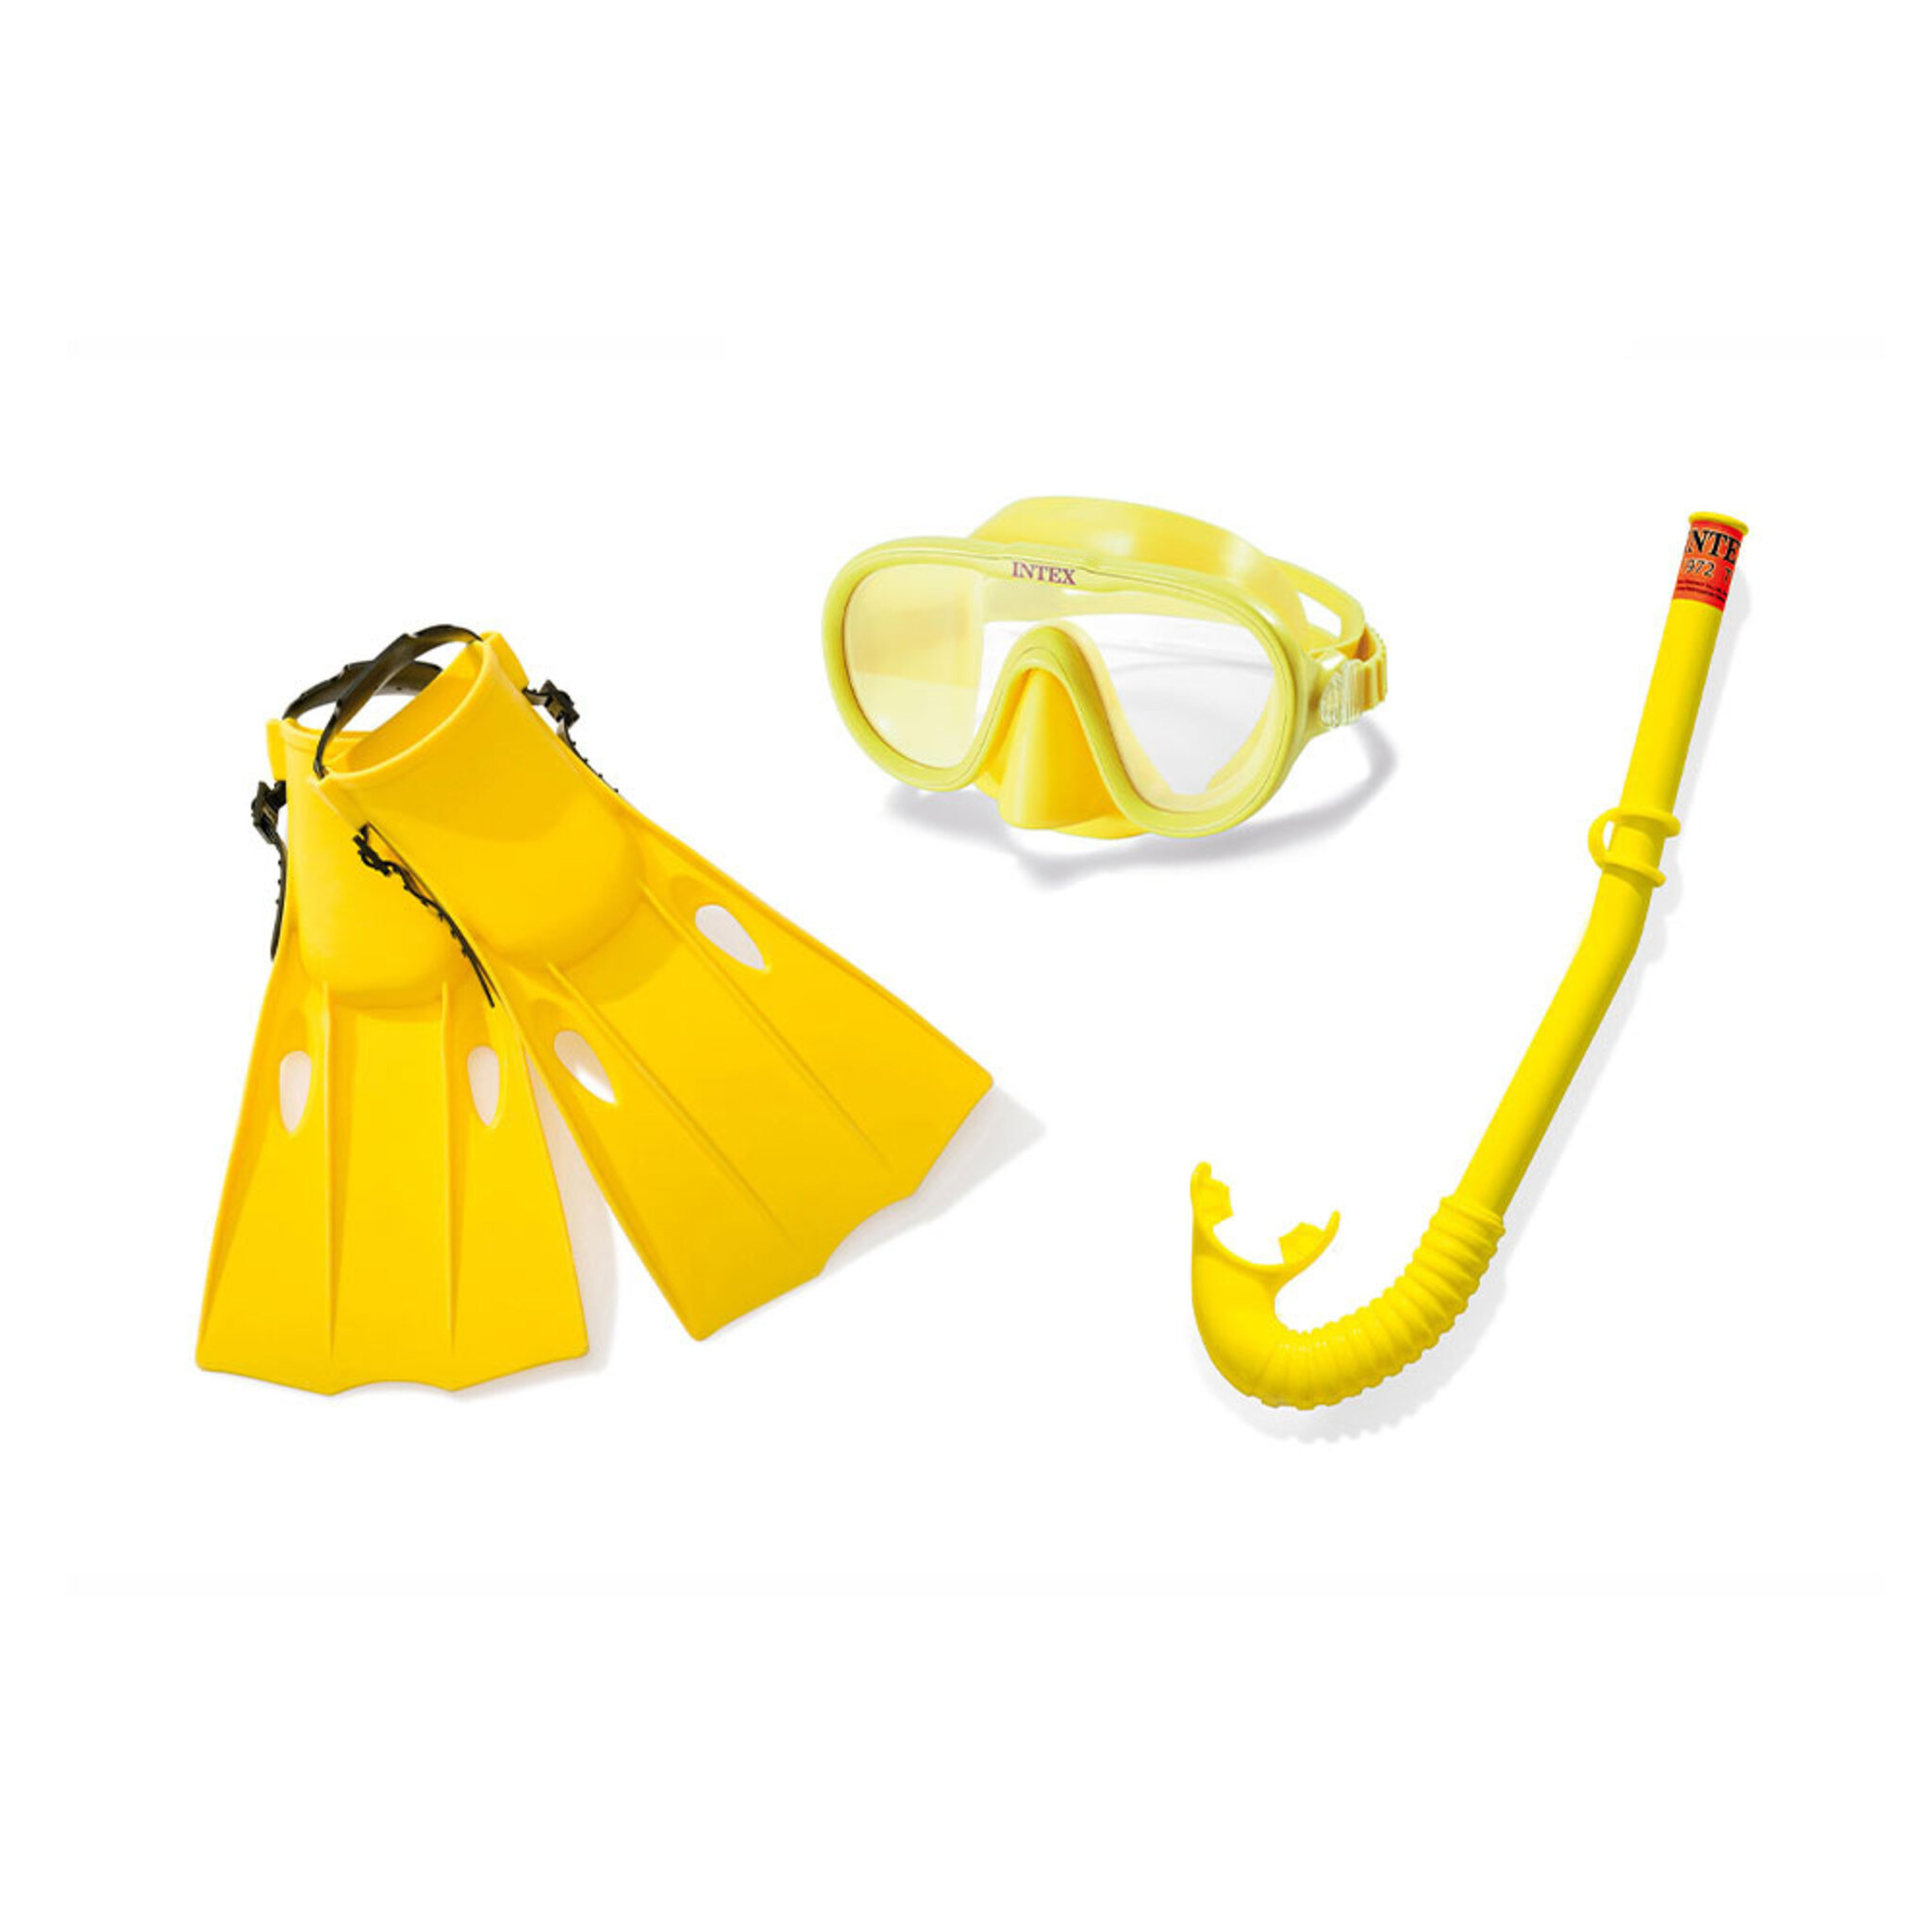 Snorkelset 3 delar - cyklop, snorkel och fenor strl 35-39